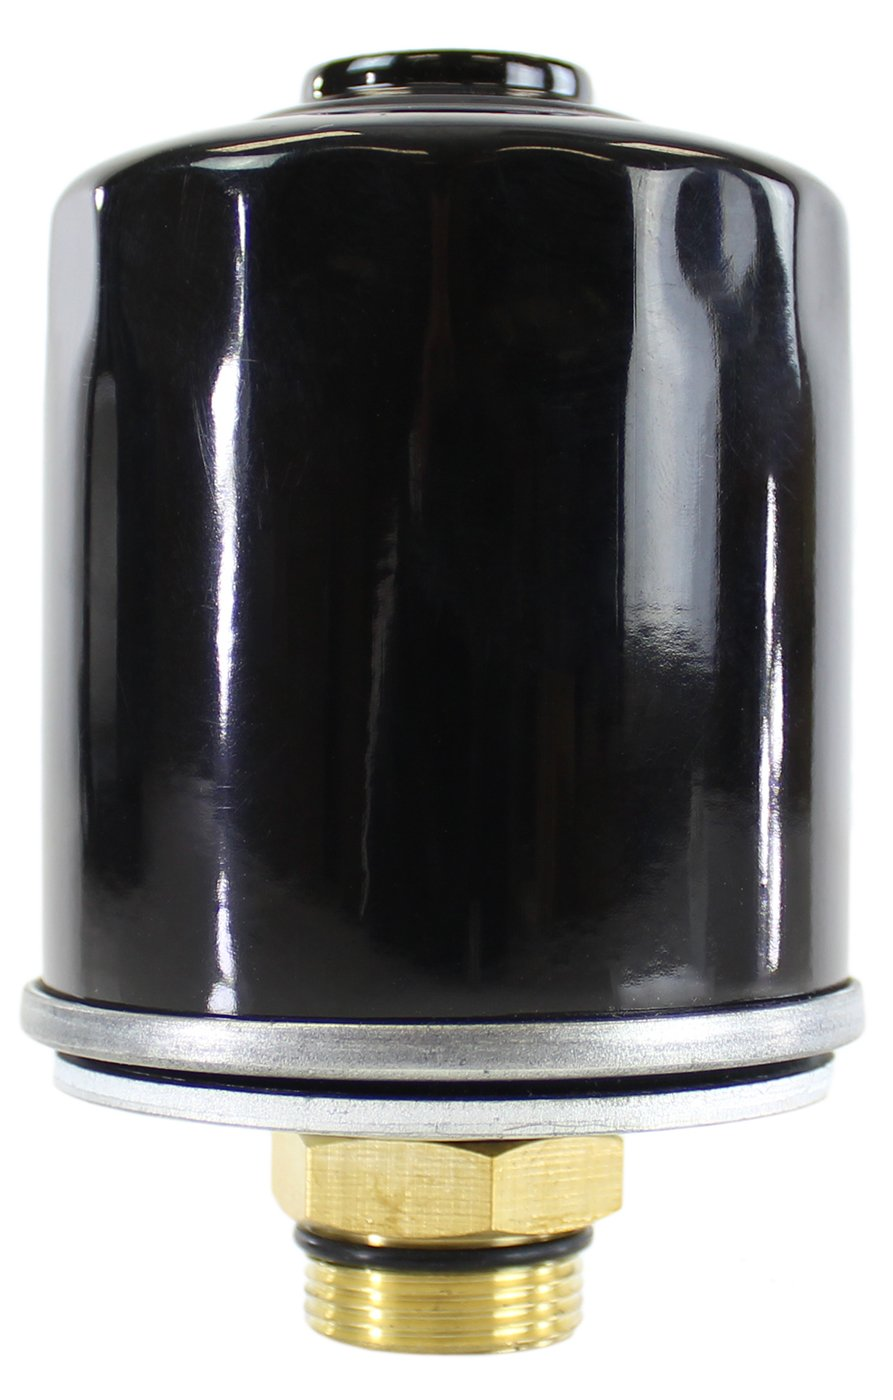 BEST VALUE VACS Carbon Exhaust Filter for VE Series Vacuum Pumps